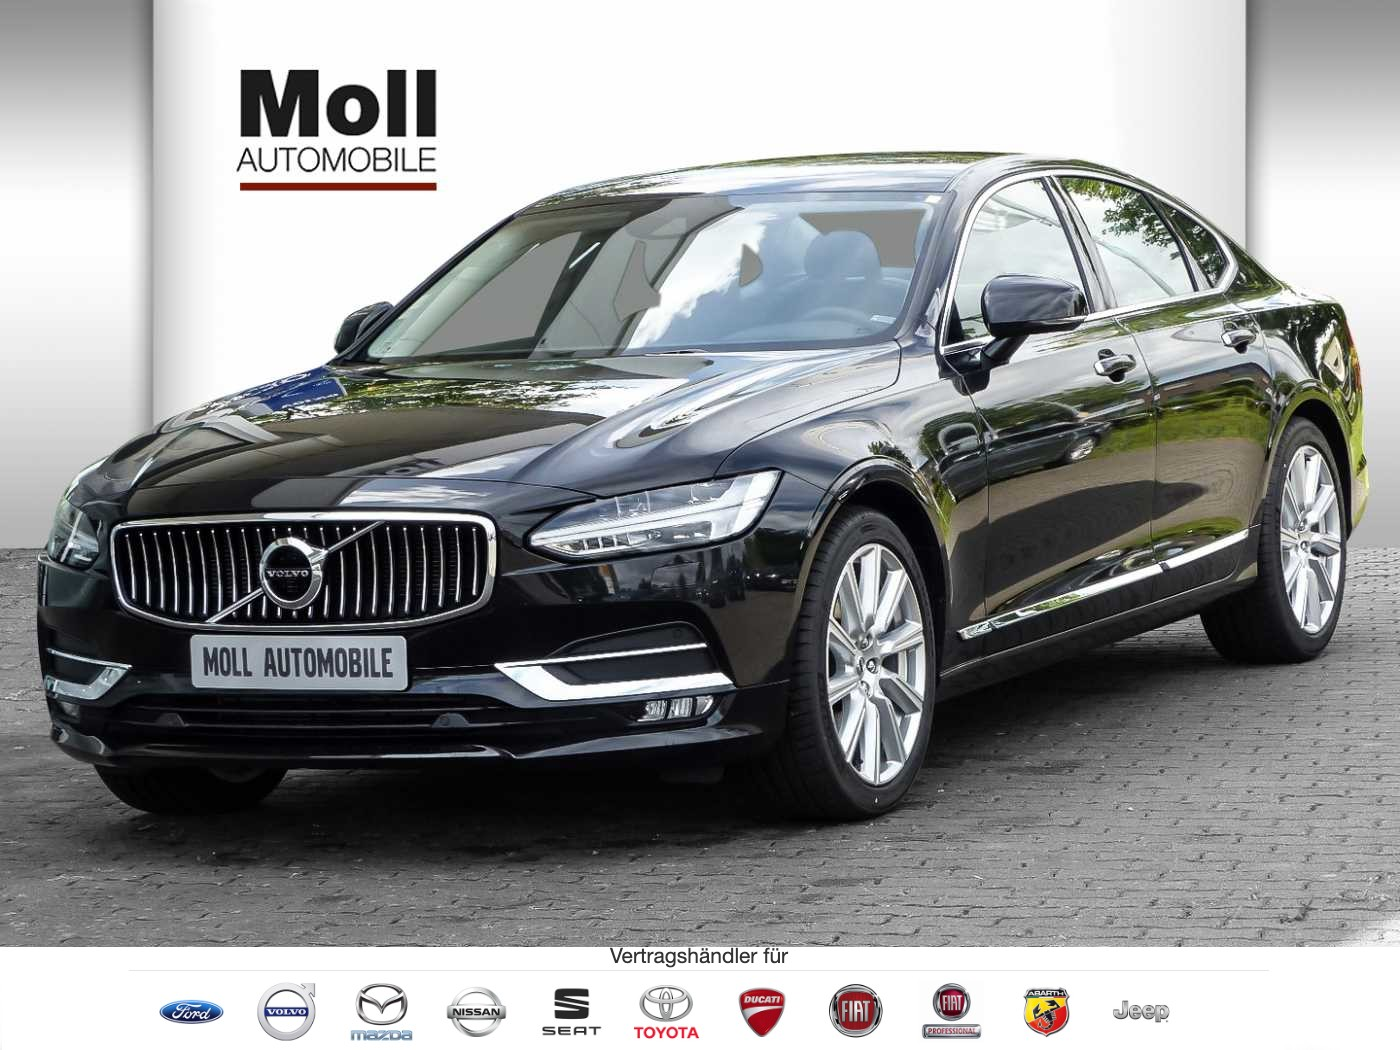 Volvo S90 T4 Geartronic Inscription Navi LED Kamera IntelliSafe, Jahr 2018, Benzin